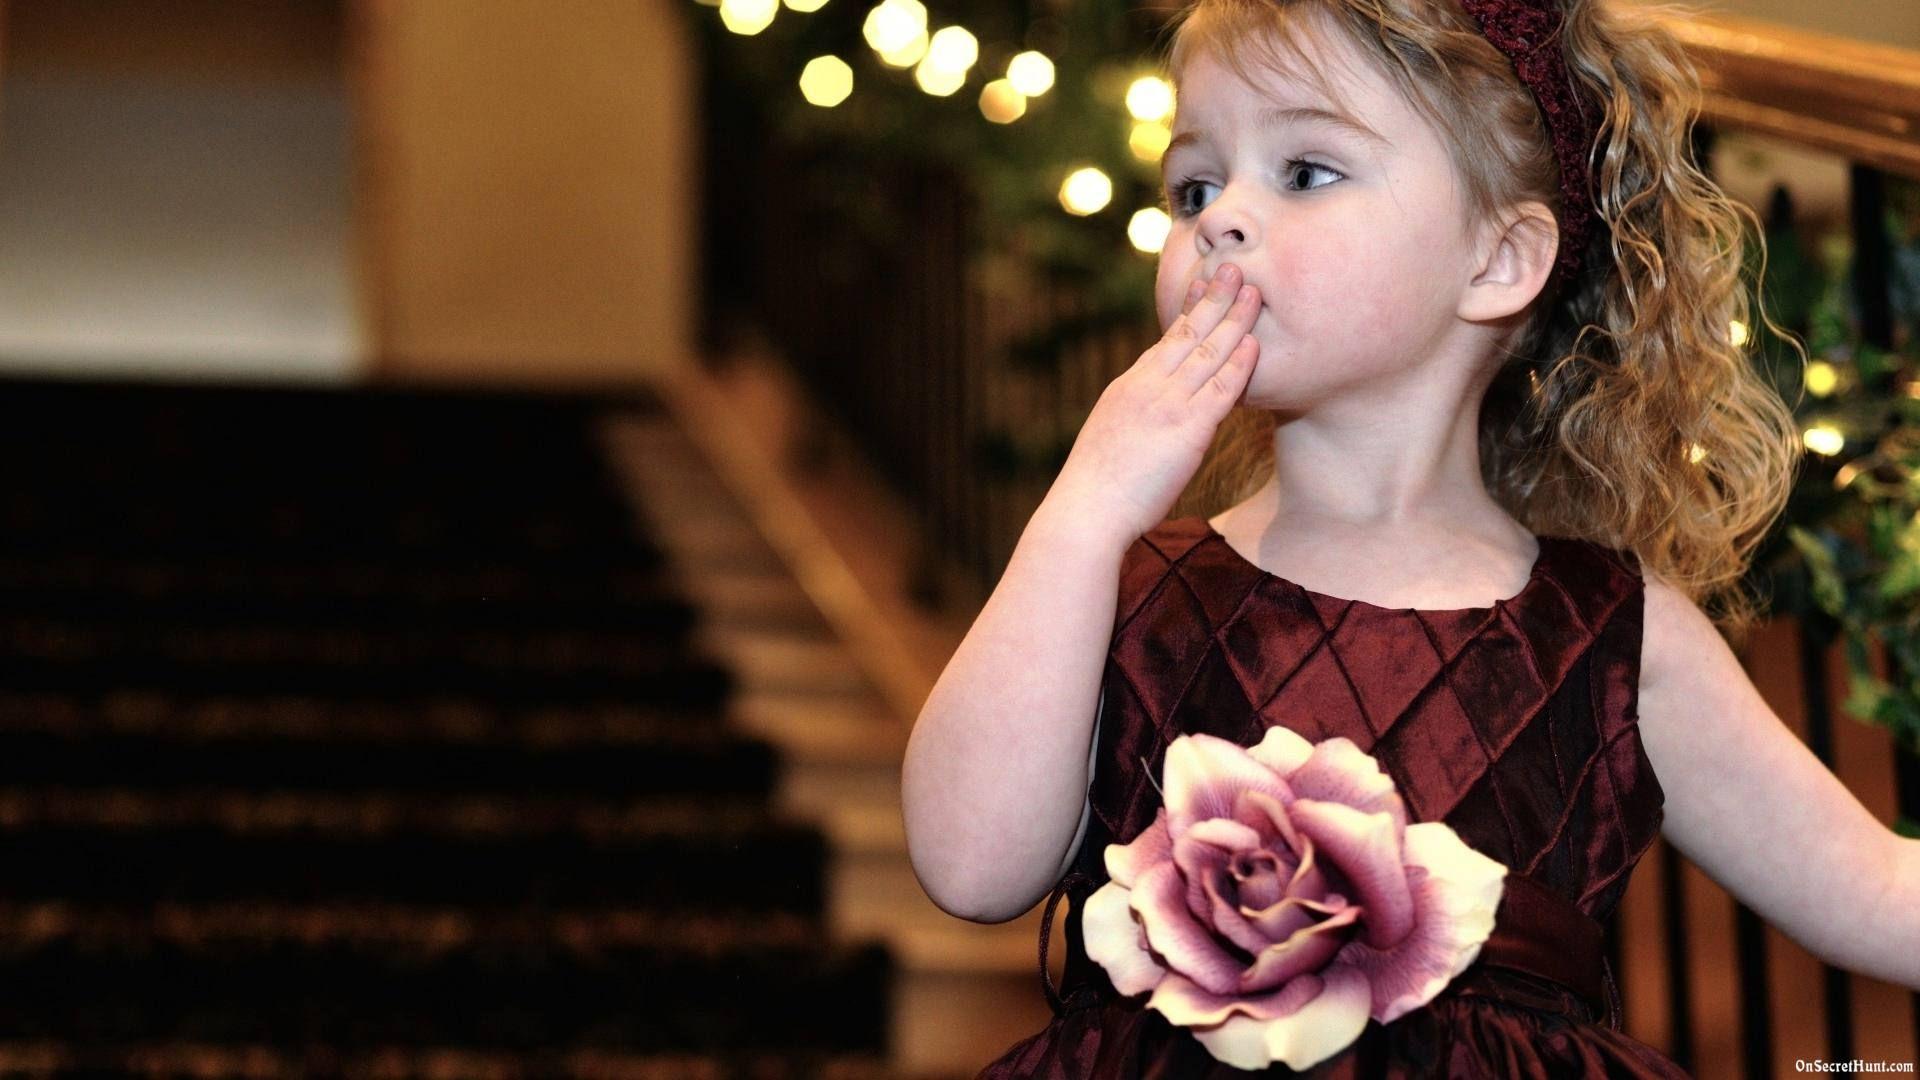 Love Wallpaper Cute Baby Girl